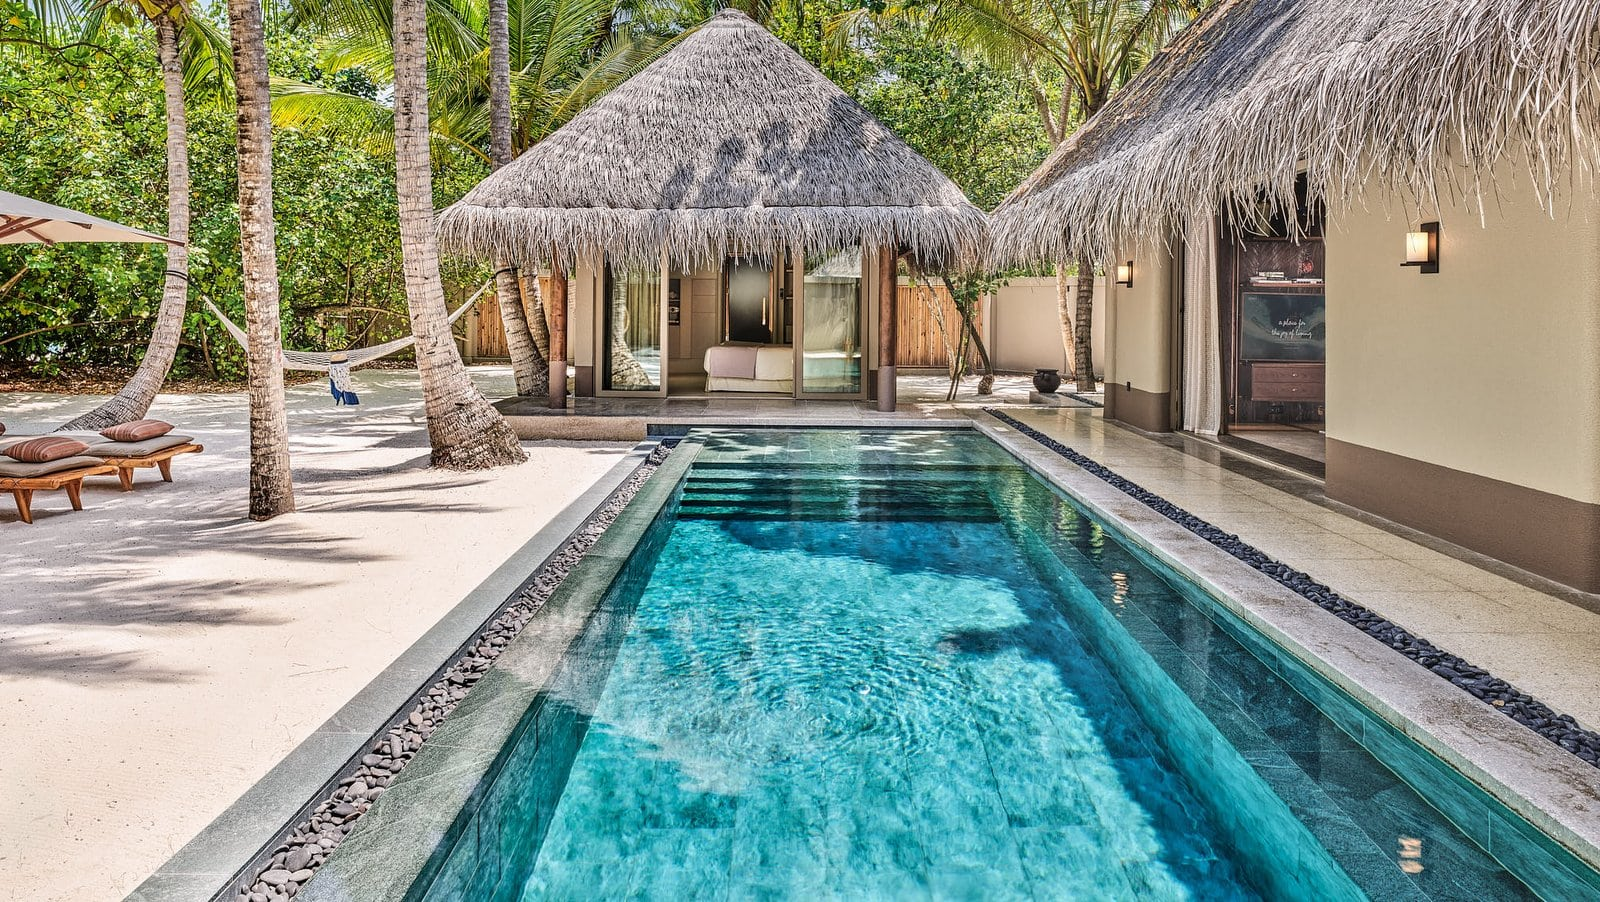 Мальдивы, отель Joali Maldives, номер Family Beach Villa with two pools